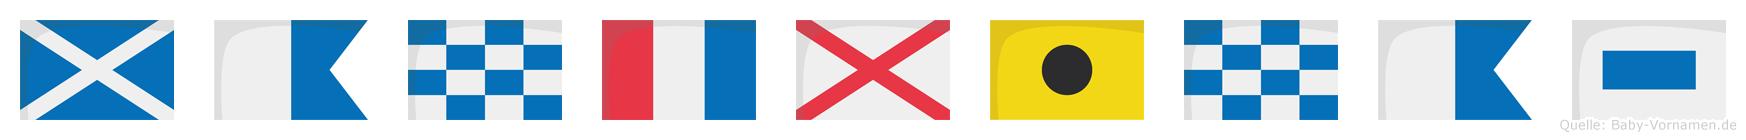 Mantvinas im Flaggenalphabet